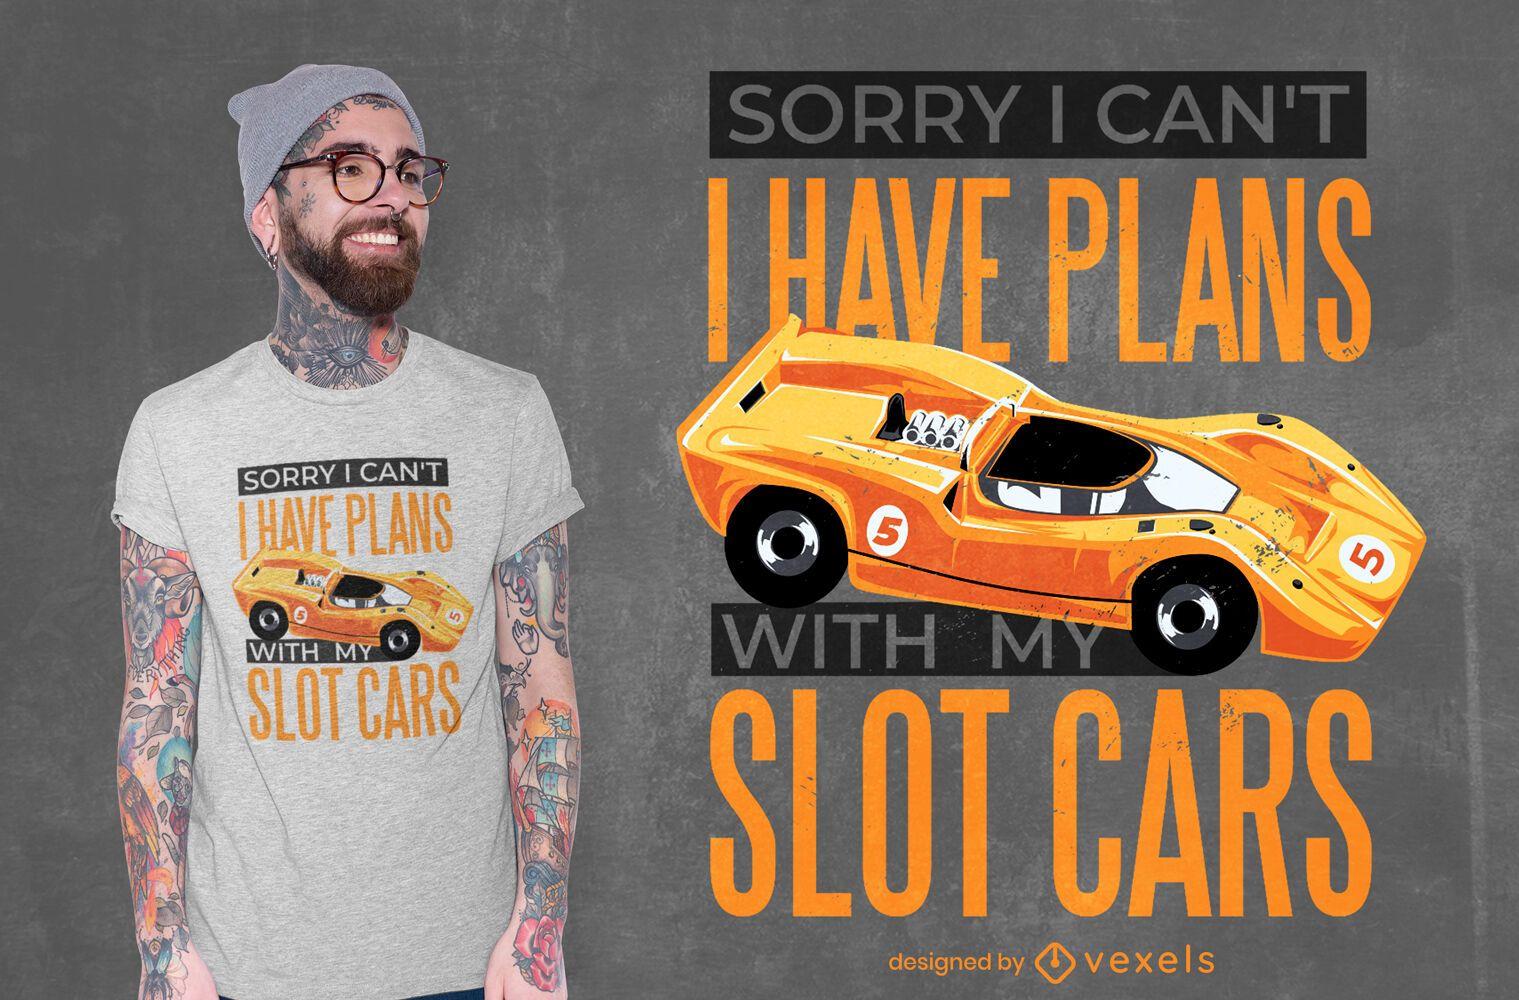 Slot cars quote t-shirt design